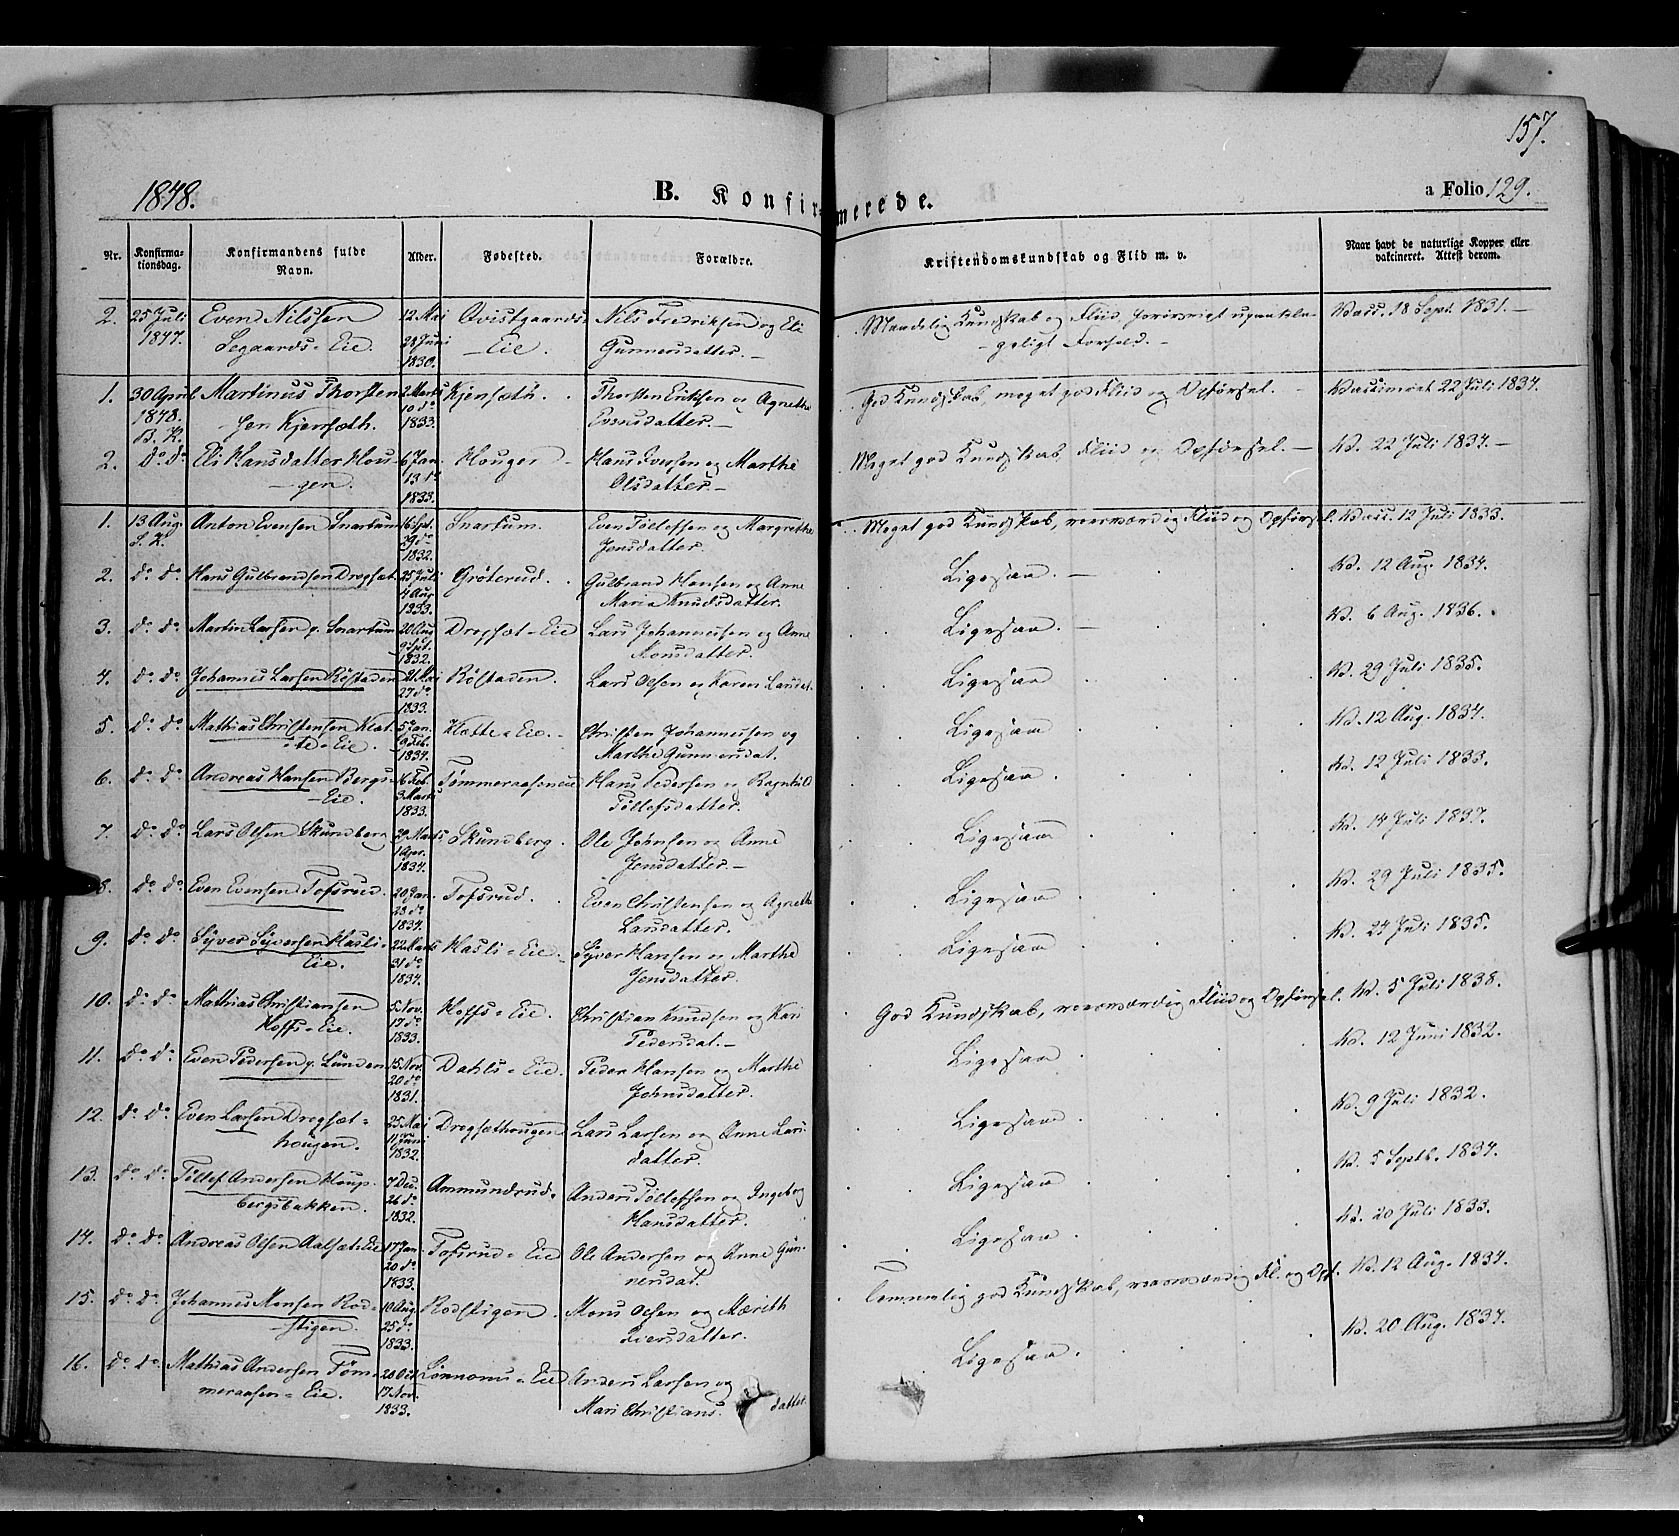 SAH, Biri prestekontor, Ministerialbok nr. 5, 1843-1854, s. 157